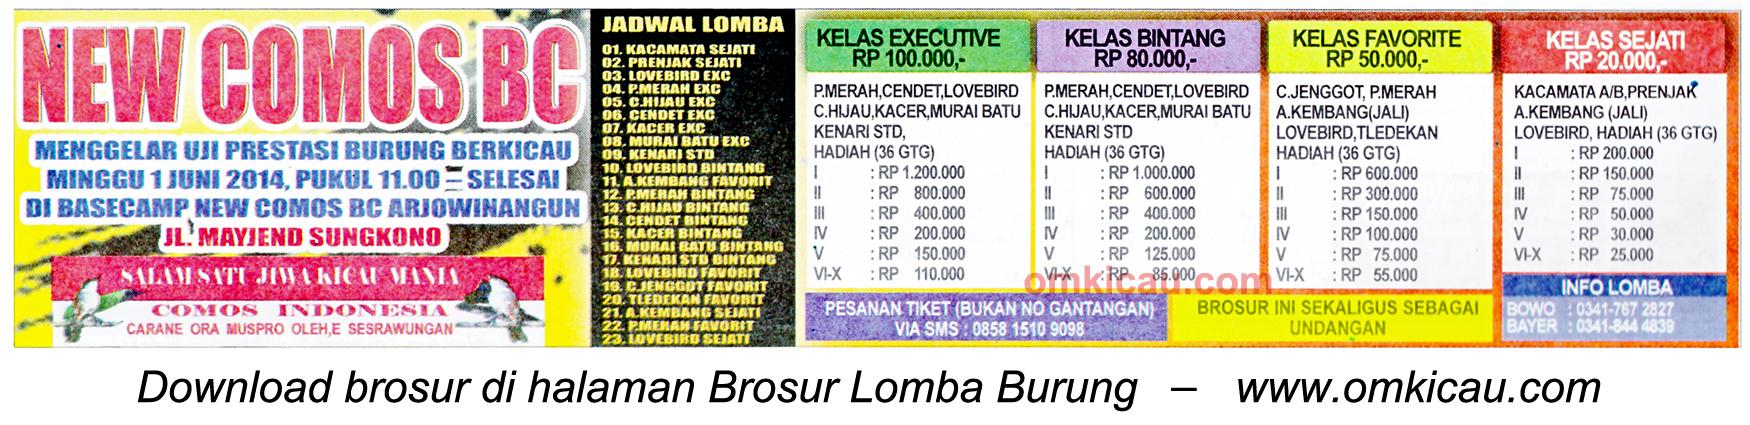 Brosur Lomba Burung Berkicau New Comos BC, Malang, 1 Juni 2014